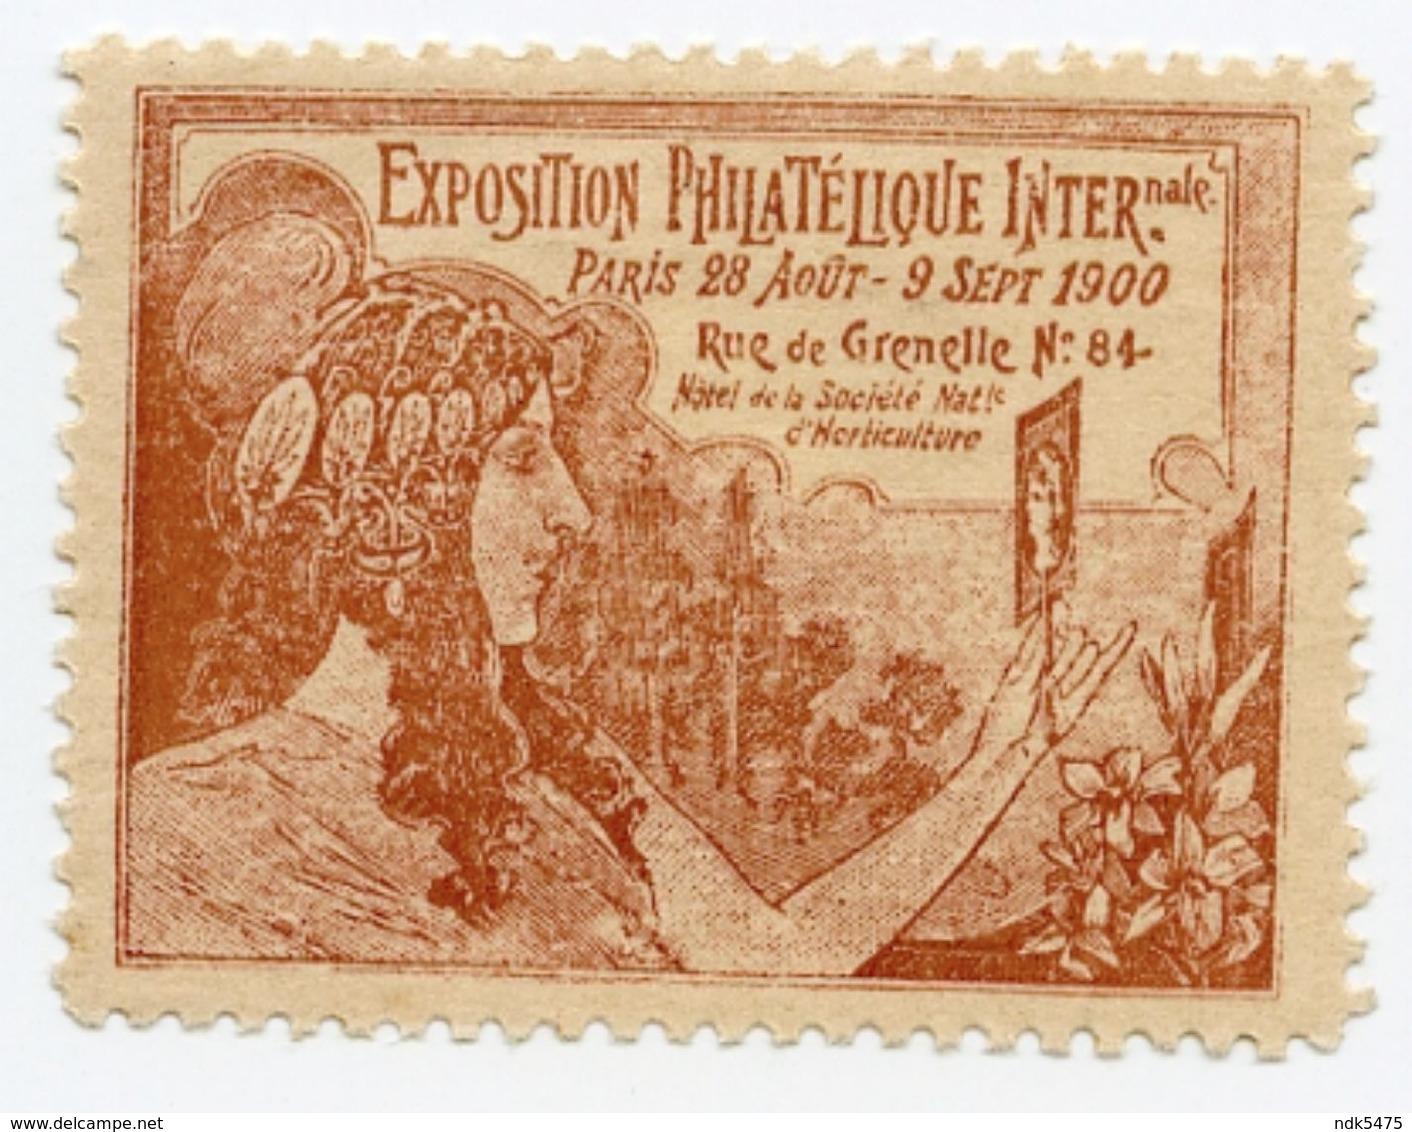 CINDERELLA : FRANCE - PARIS, EXPOSITION PHILATELIQUE INTERNATIONALE, 1900 - Cinderellas